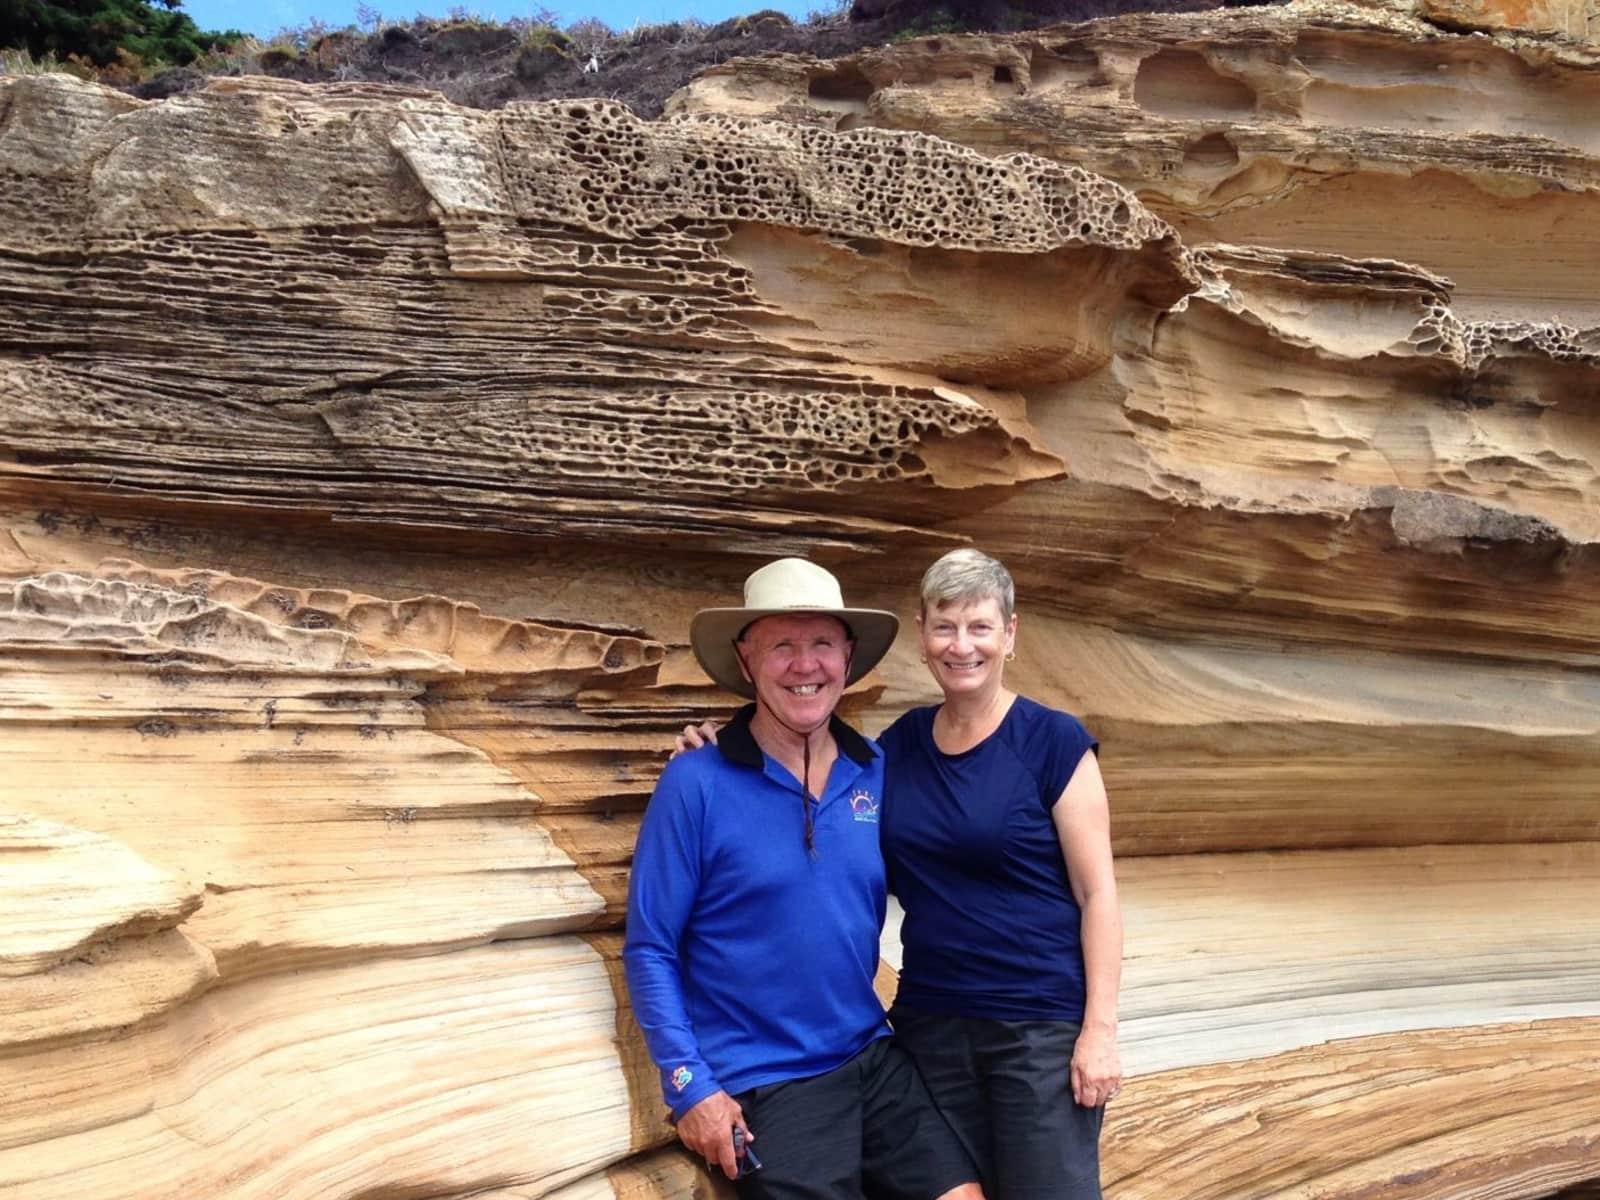 Raine & Allan from Tweed Heads, New South Wales, Australia